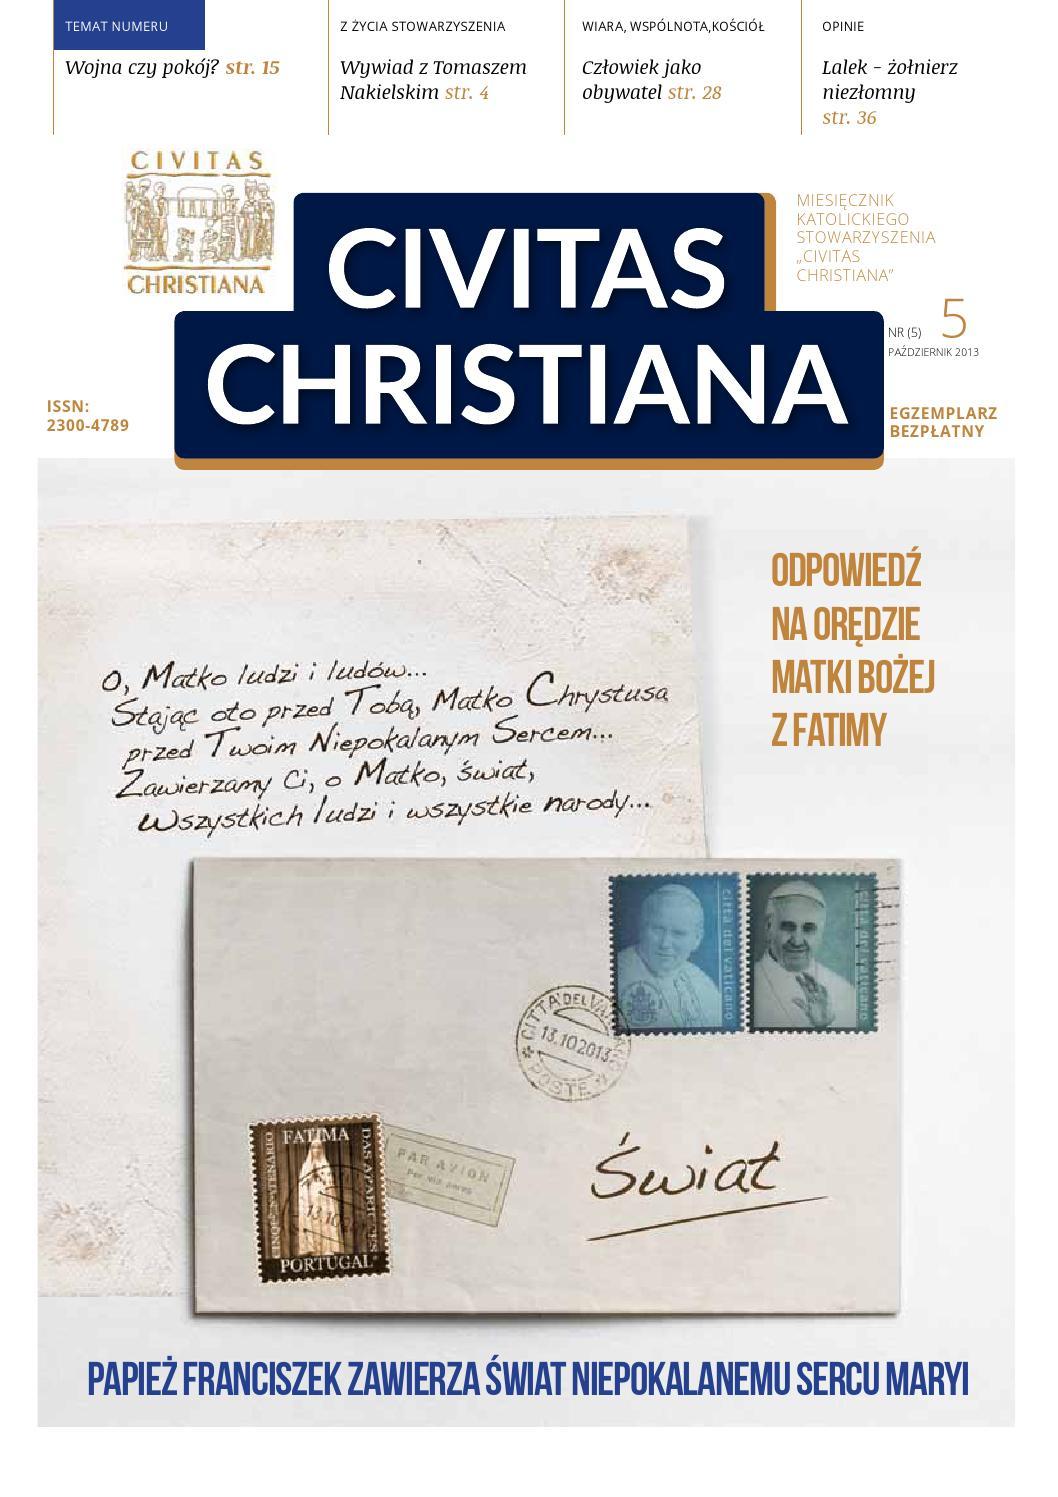 Nr 5 Civitas Christiana By Civitaschristiana Issuu